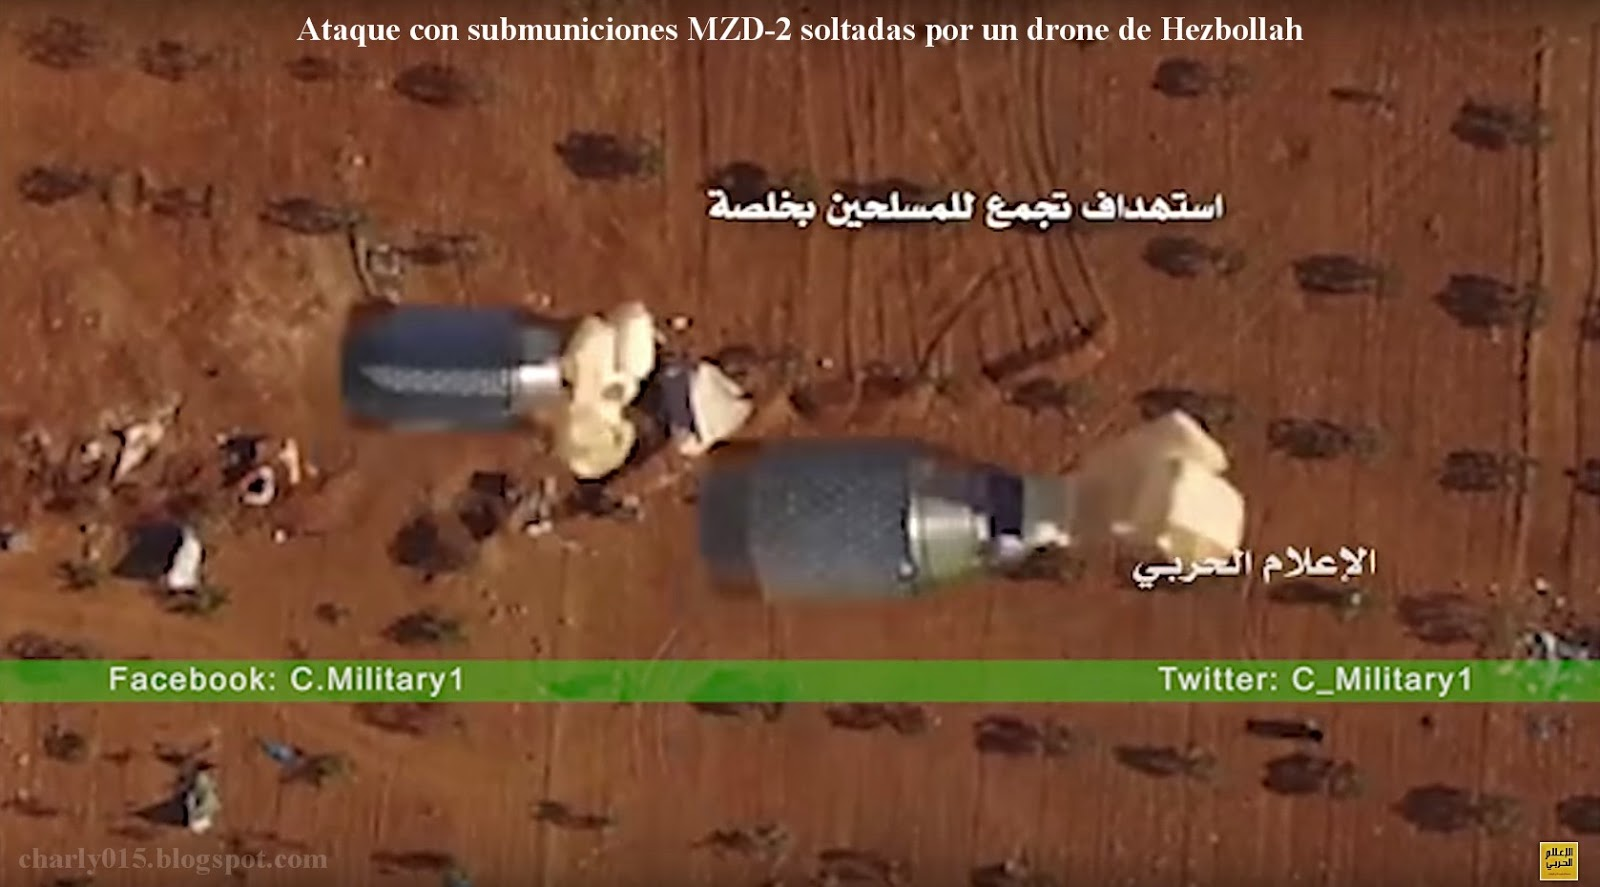 ataque%2Bhezbola%2Bdrone%2B2016-8-8.jpg